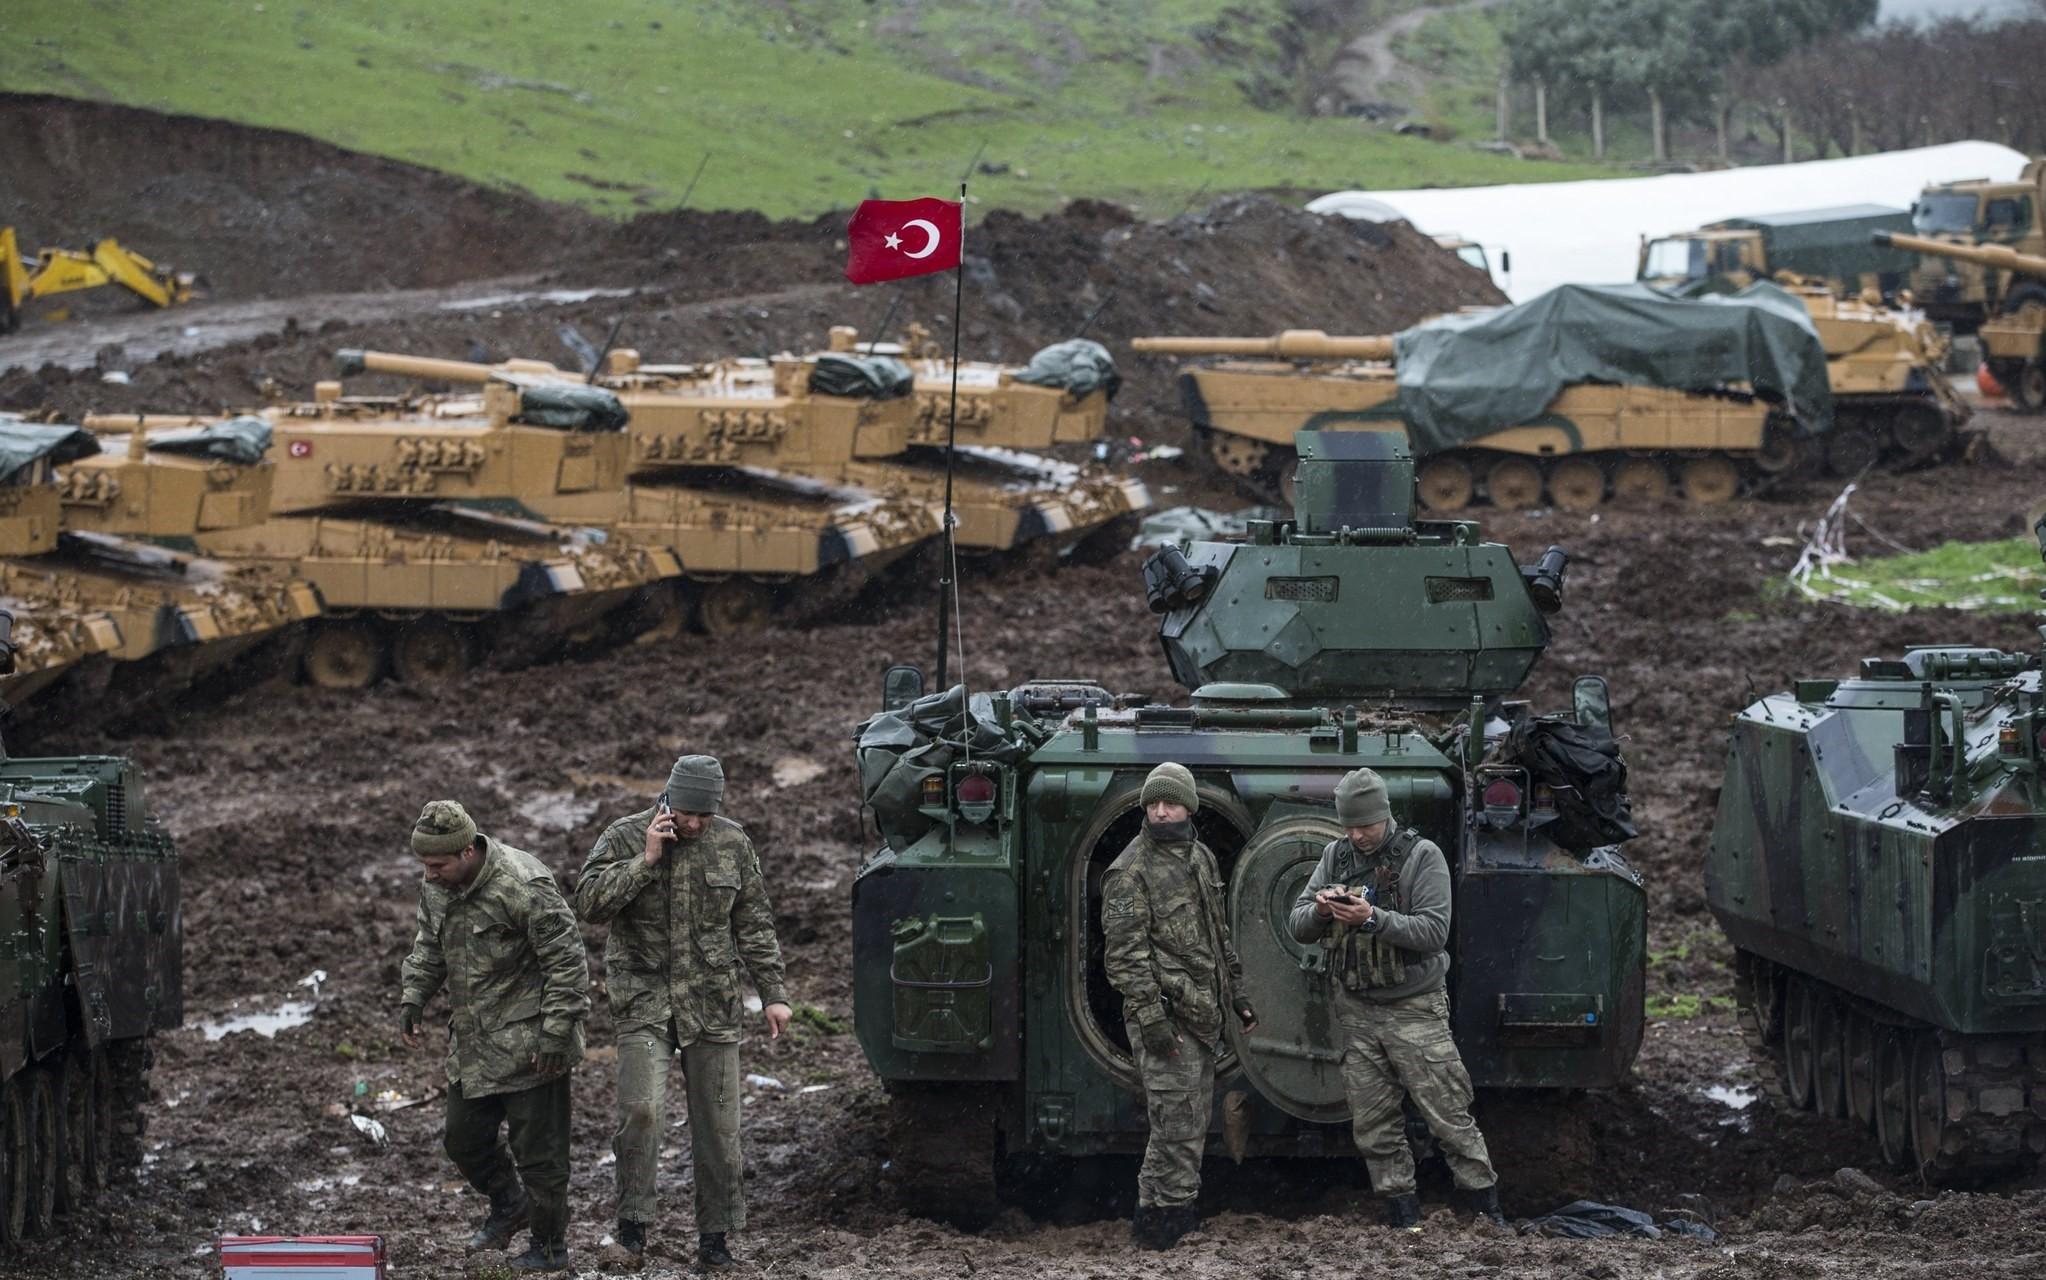 Turkish soldiers training with their tanks near Syrian-Turkish border, at Hatay, Turkey, 23 January 2018. (EPA Photo)